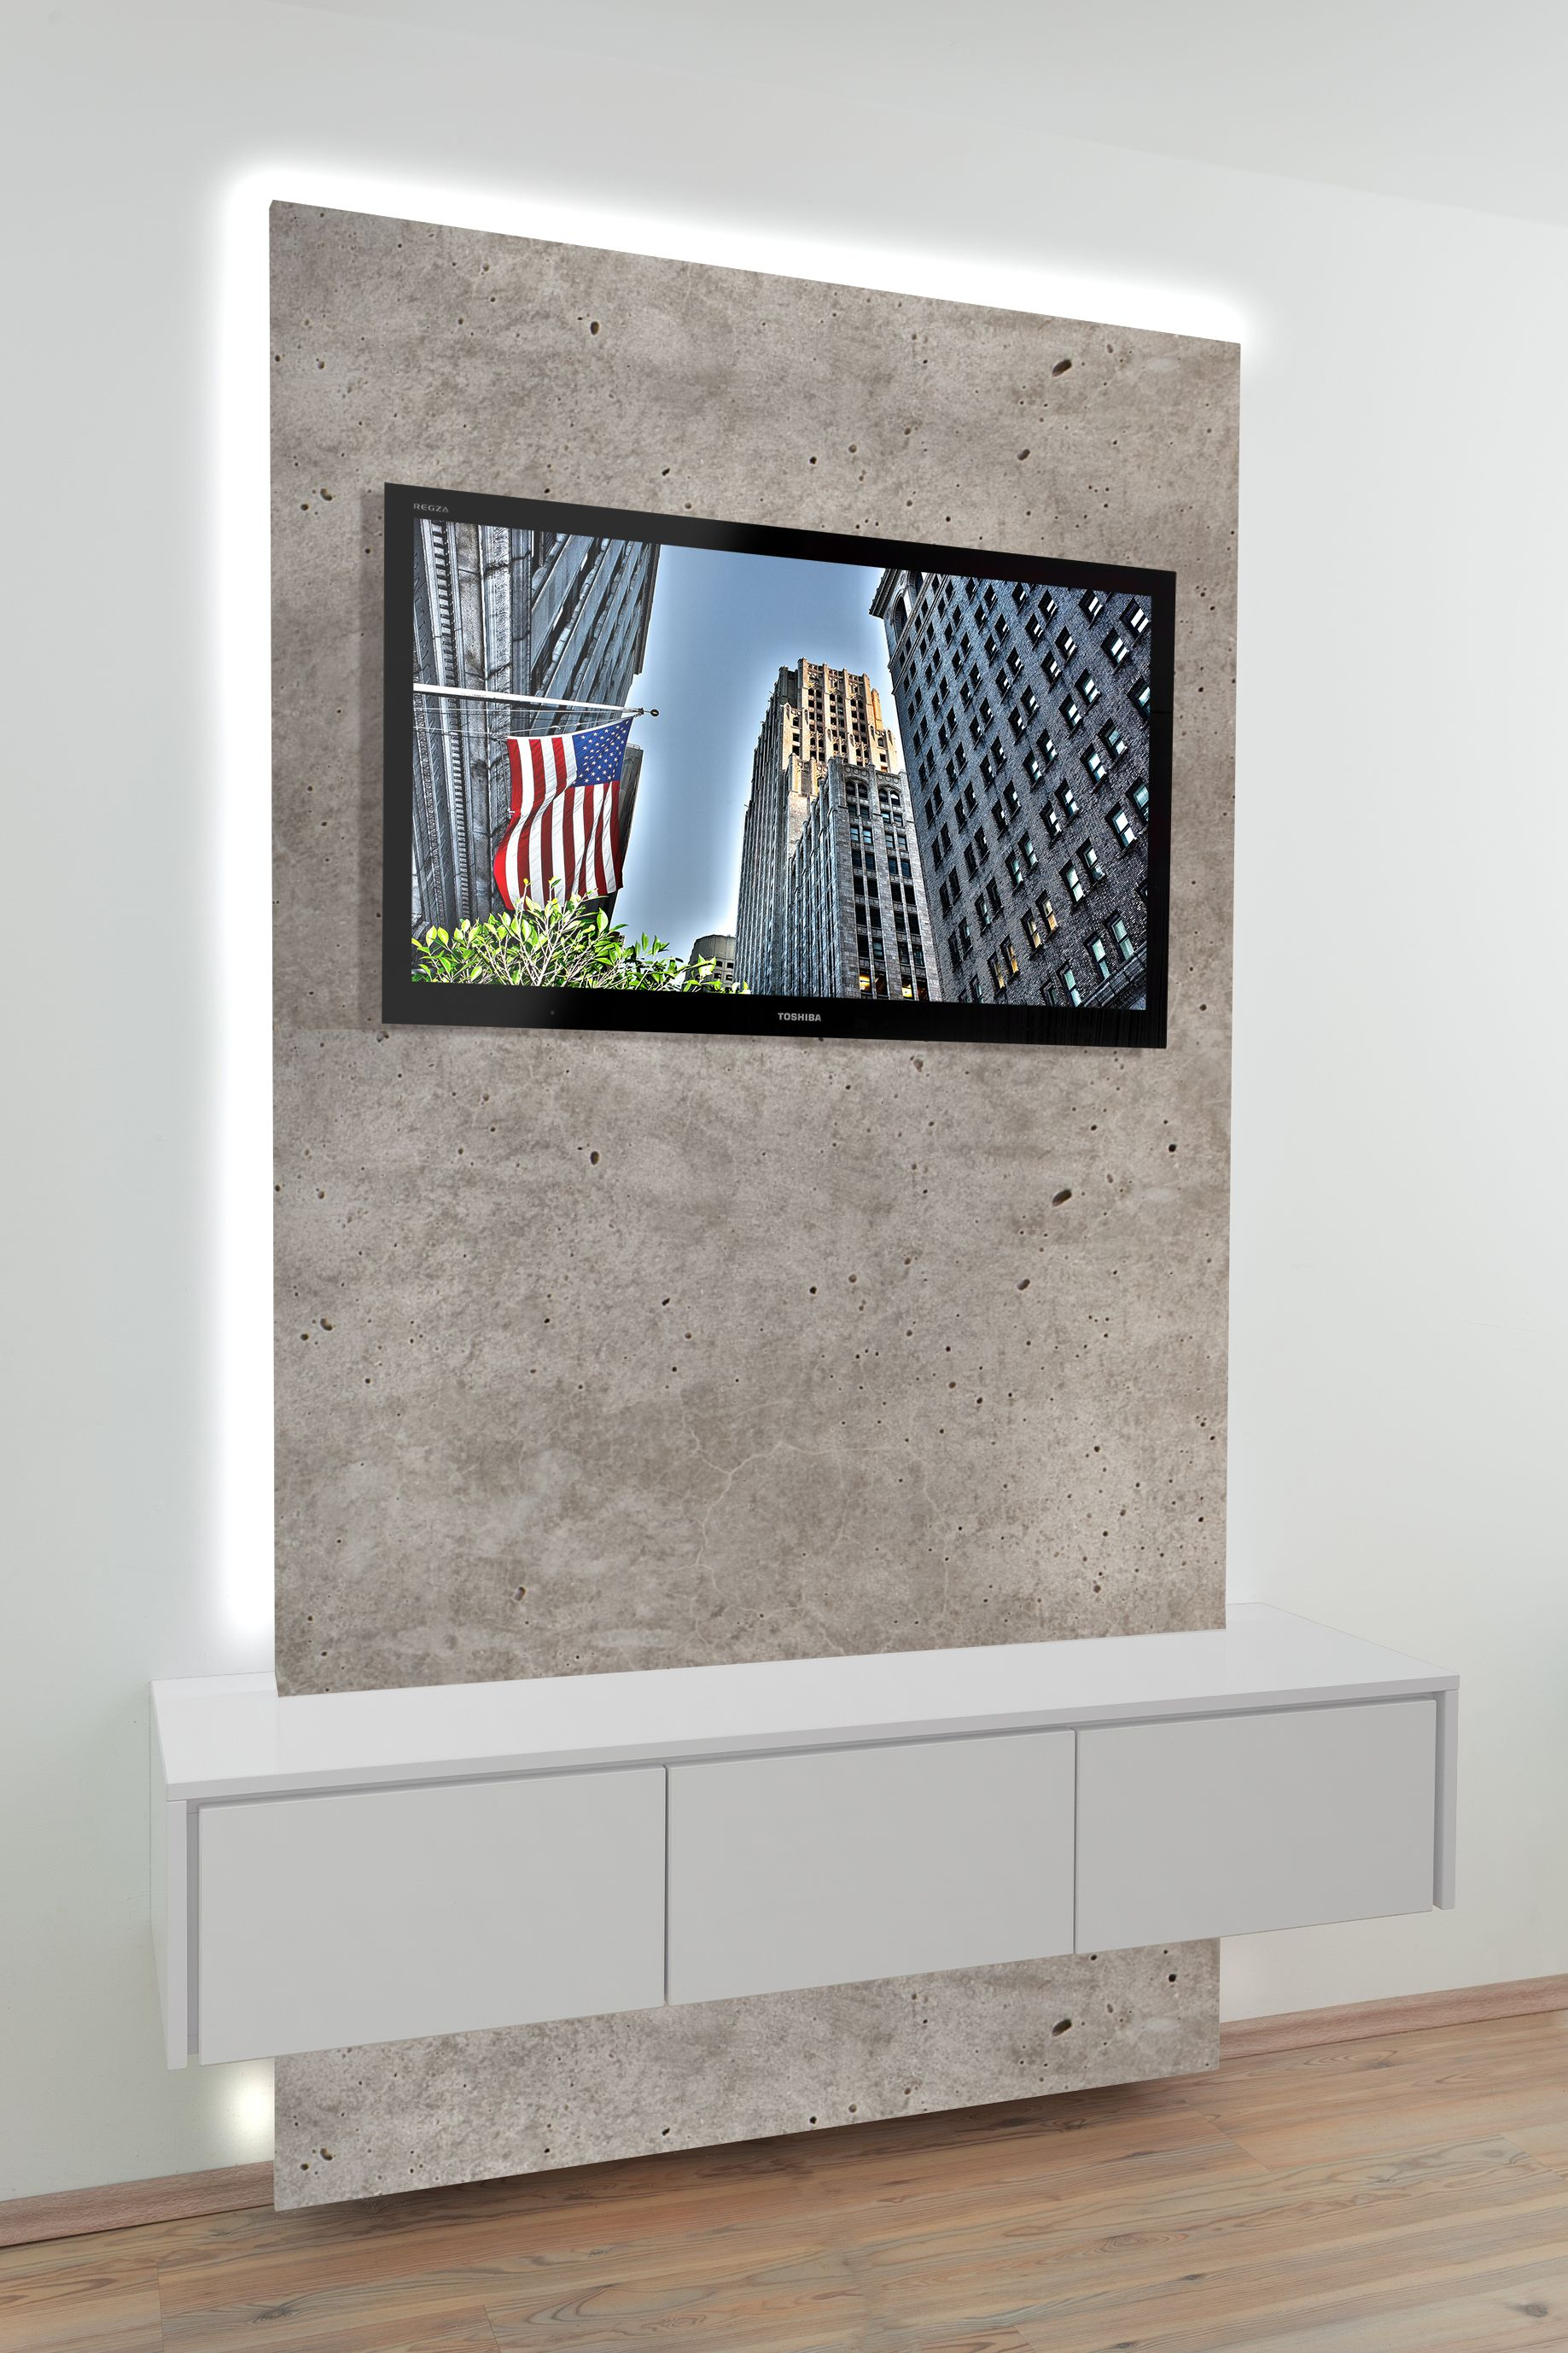 Tv Wall By Luxframes Ist Die Tv Mobel Marke Fur Tv Wande Tv Wandpaneels Und Sideboards Tv Wand Tv Wand Wohnzimmer Wohnzimmer Tv Wand Ideen